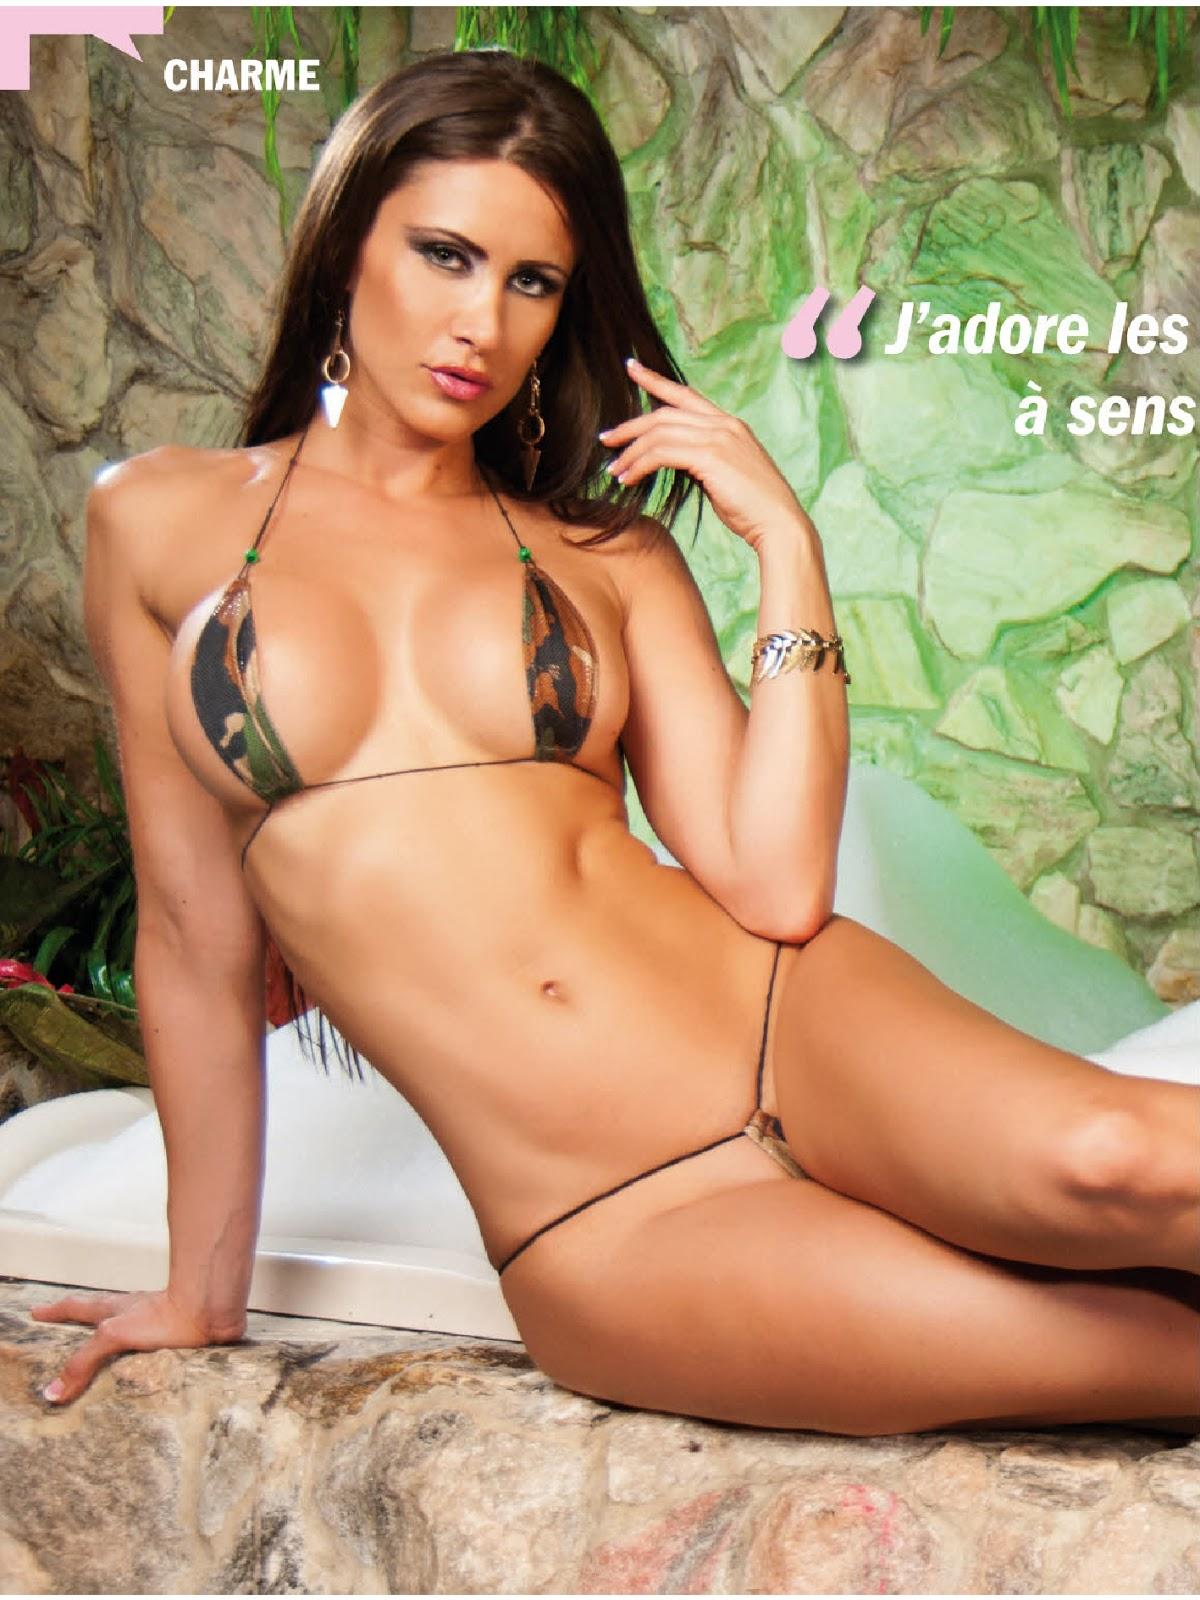 Anais Zanotti Porn Star anais zanotti naked nude sex porn images nude picture | bluedols